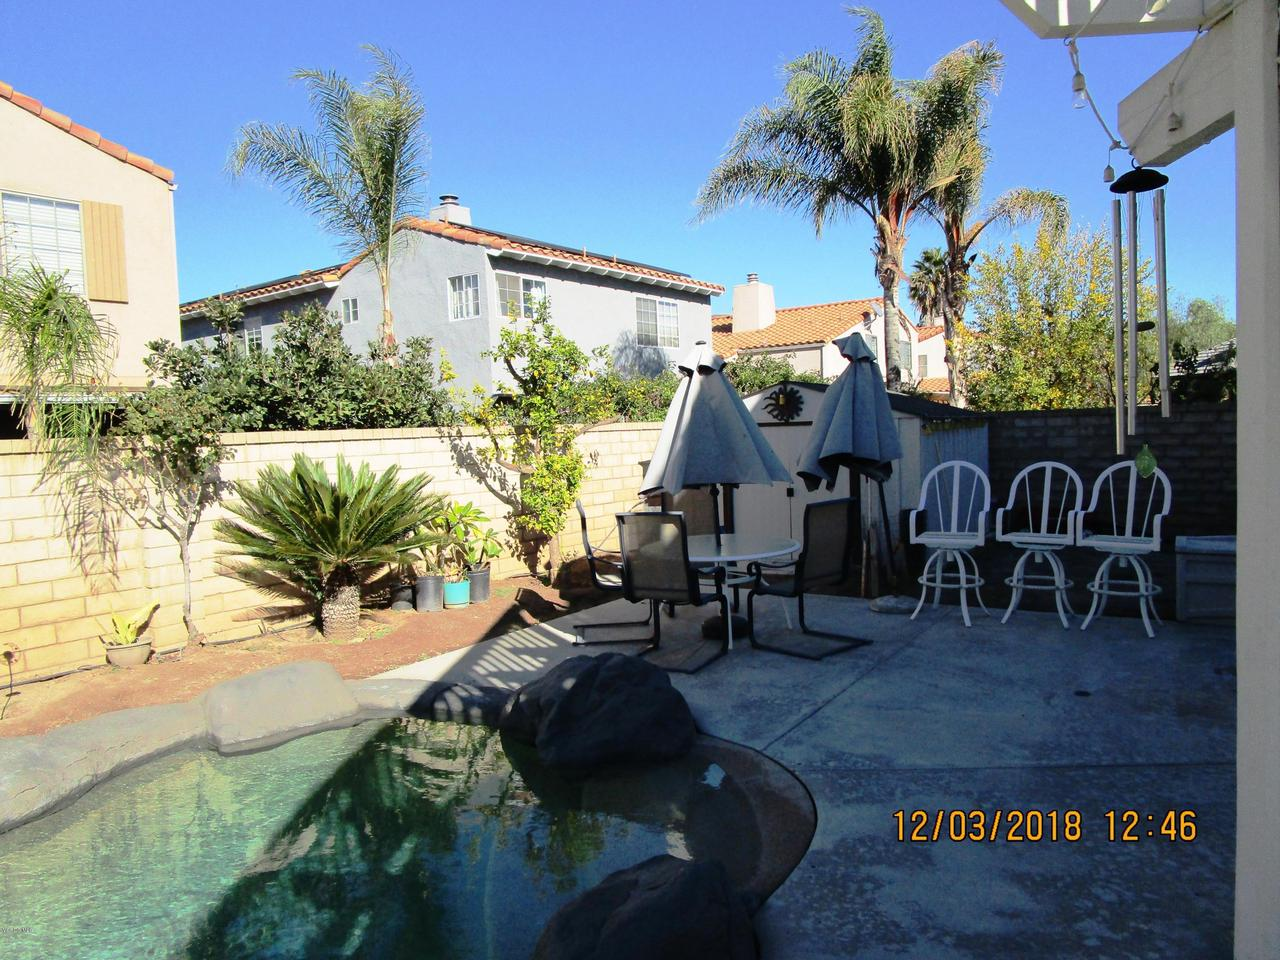 1063 MEADOWLARK, Fillmore, CA 93015 - lemon trees 2